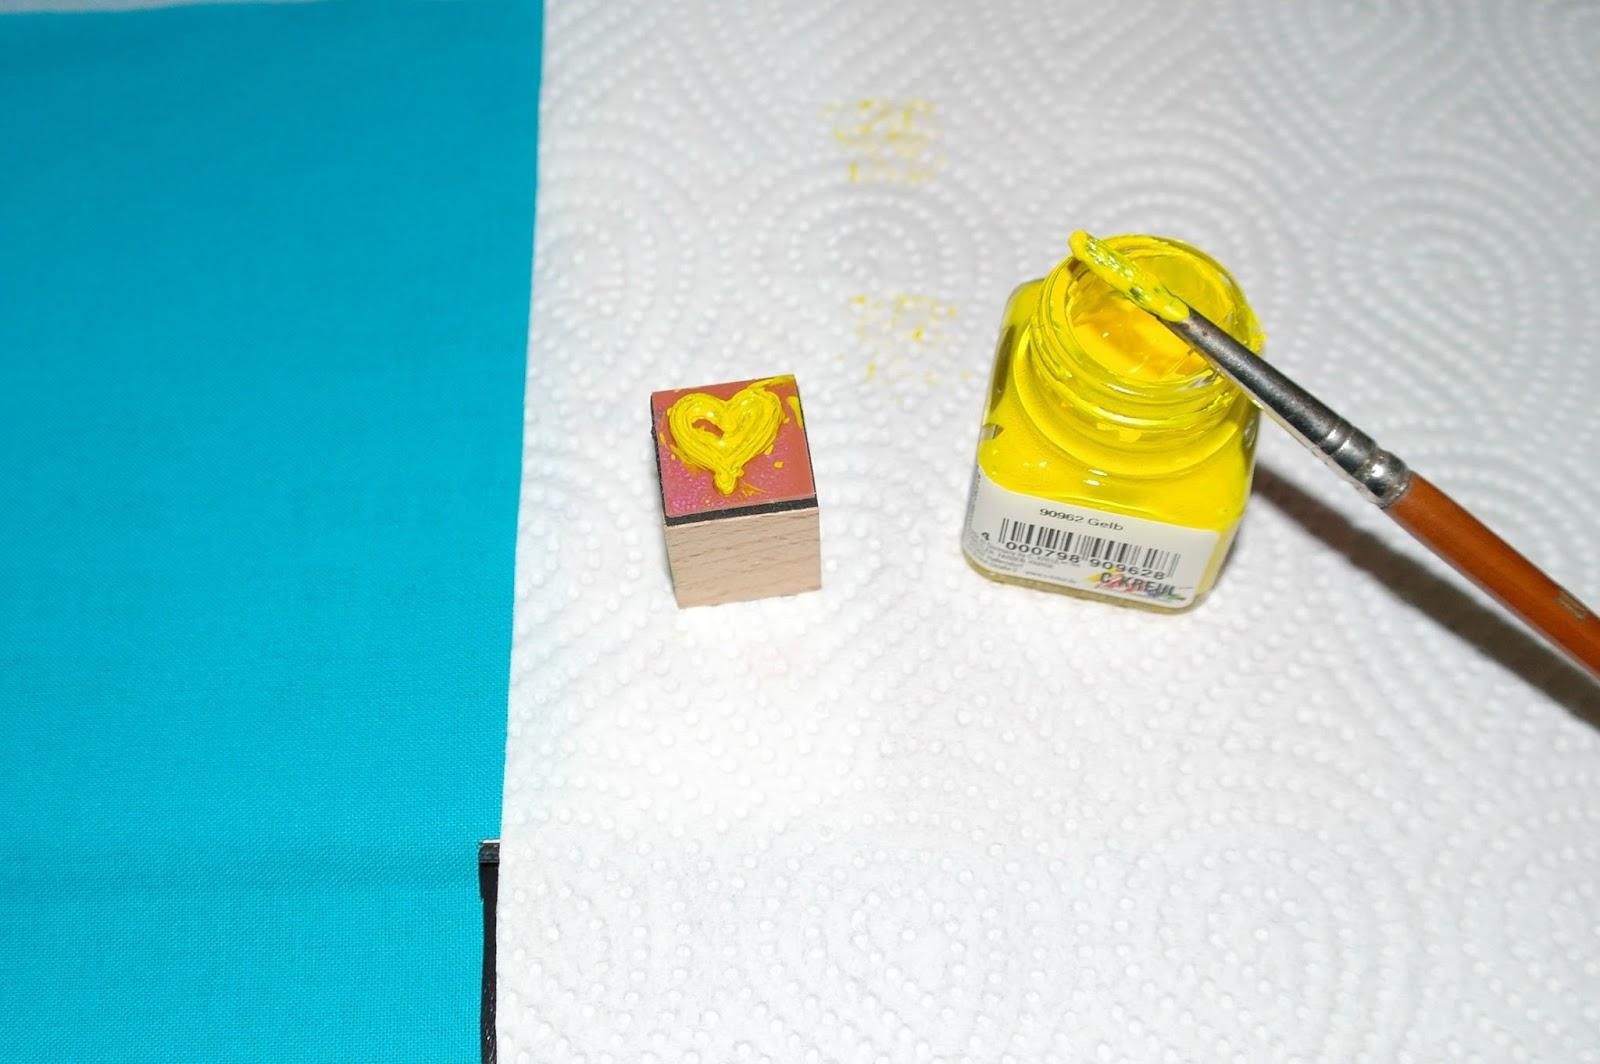 hauptstadtmonster herzen utensilos aka stoffe bedrucken mit stempel. Black Bedroom Furniture Sets. Home Design Ideas